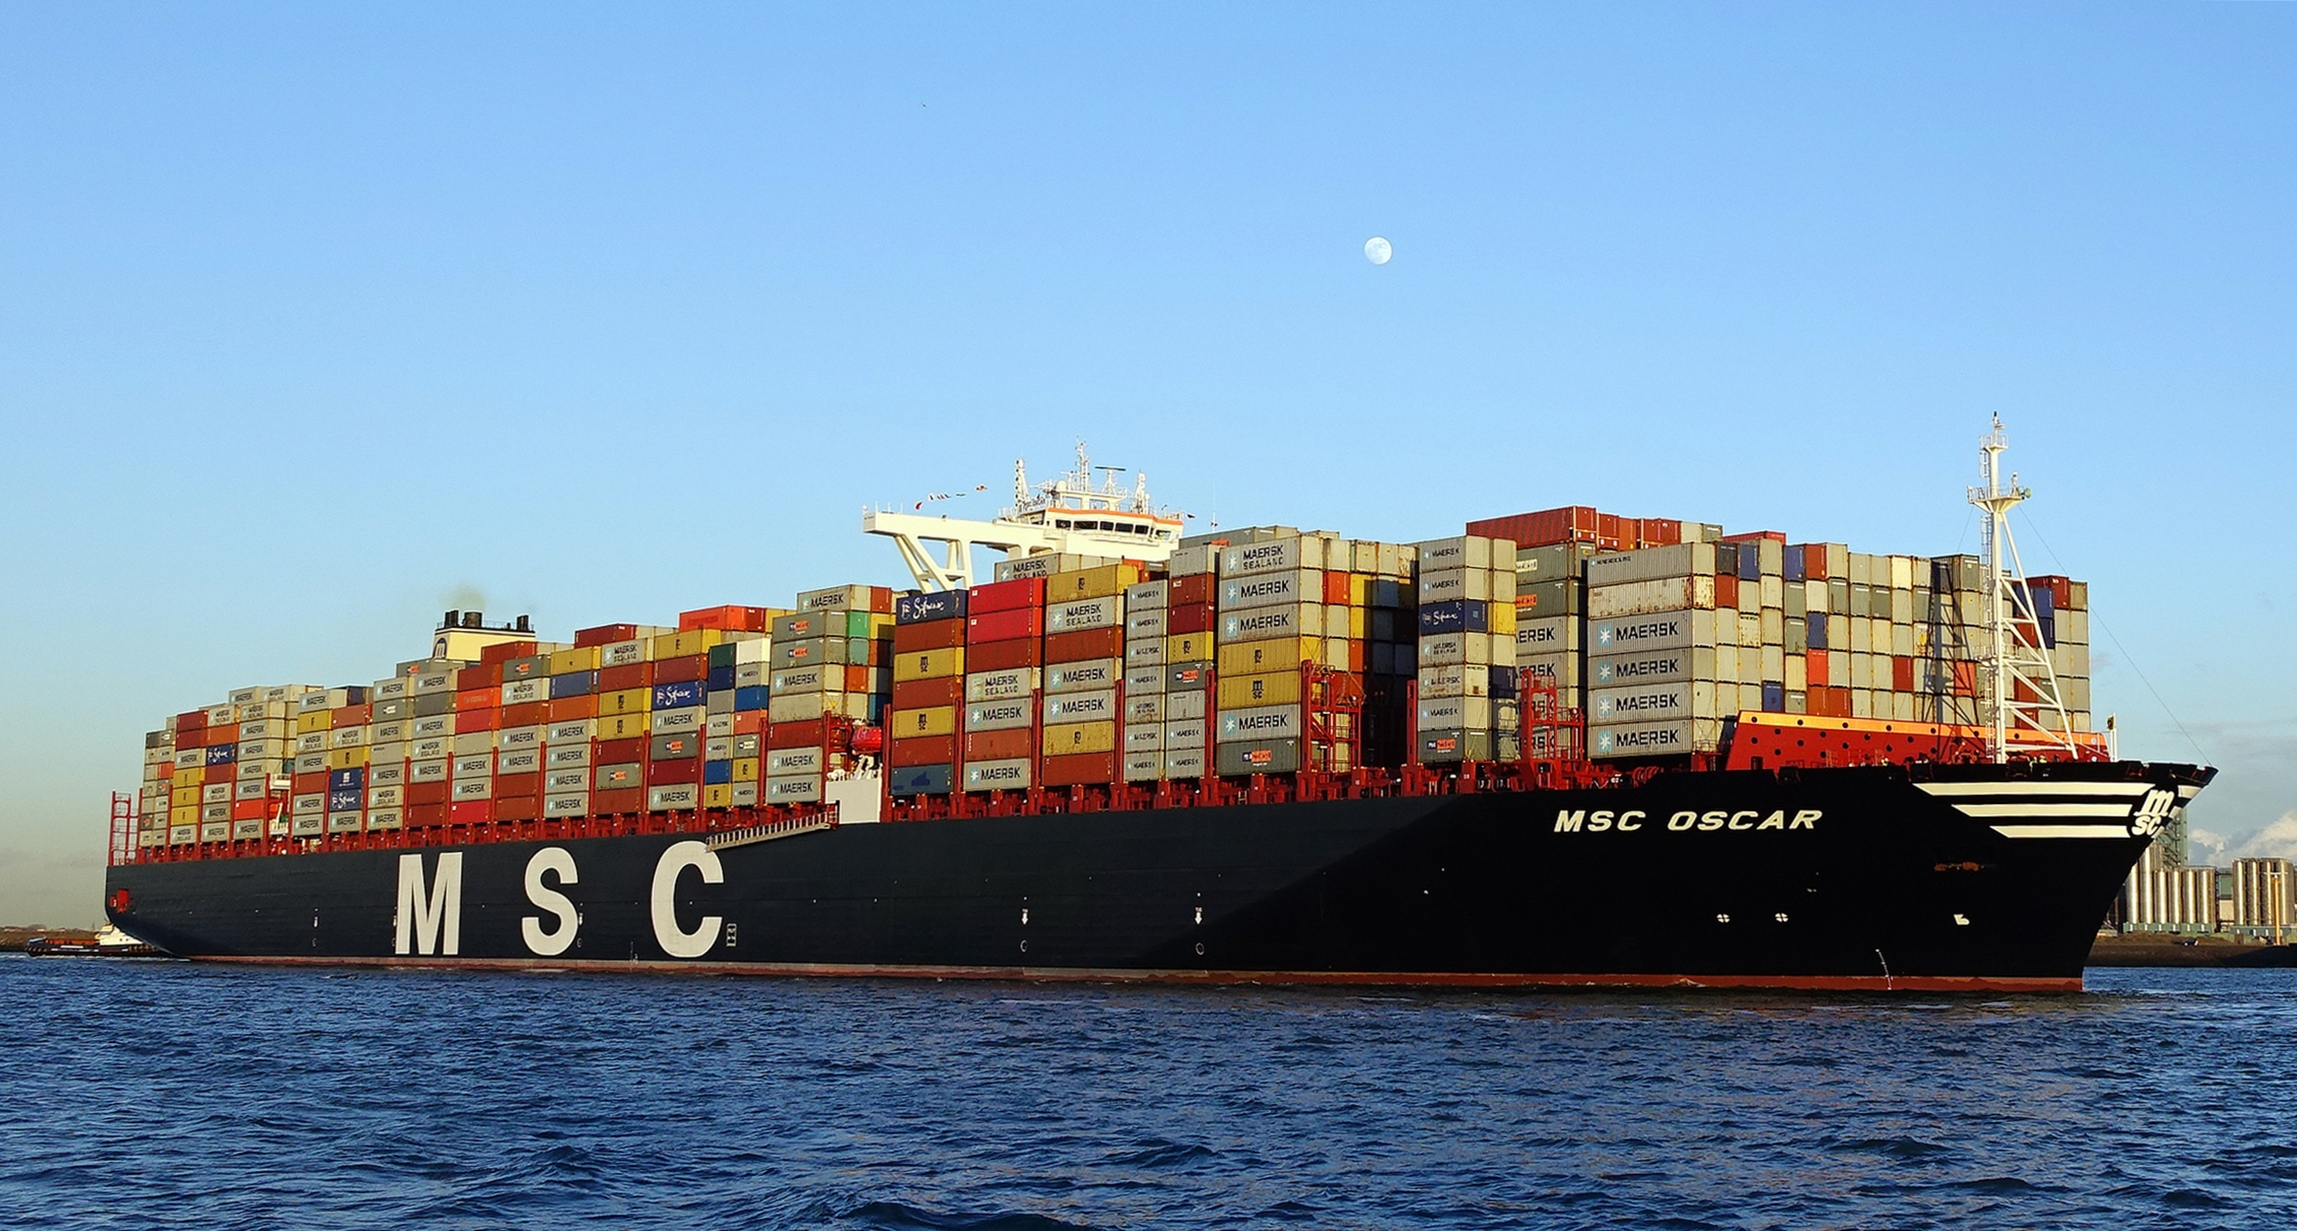 MSC_Oscar_(ship,_2014)_002